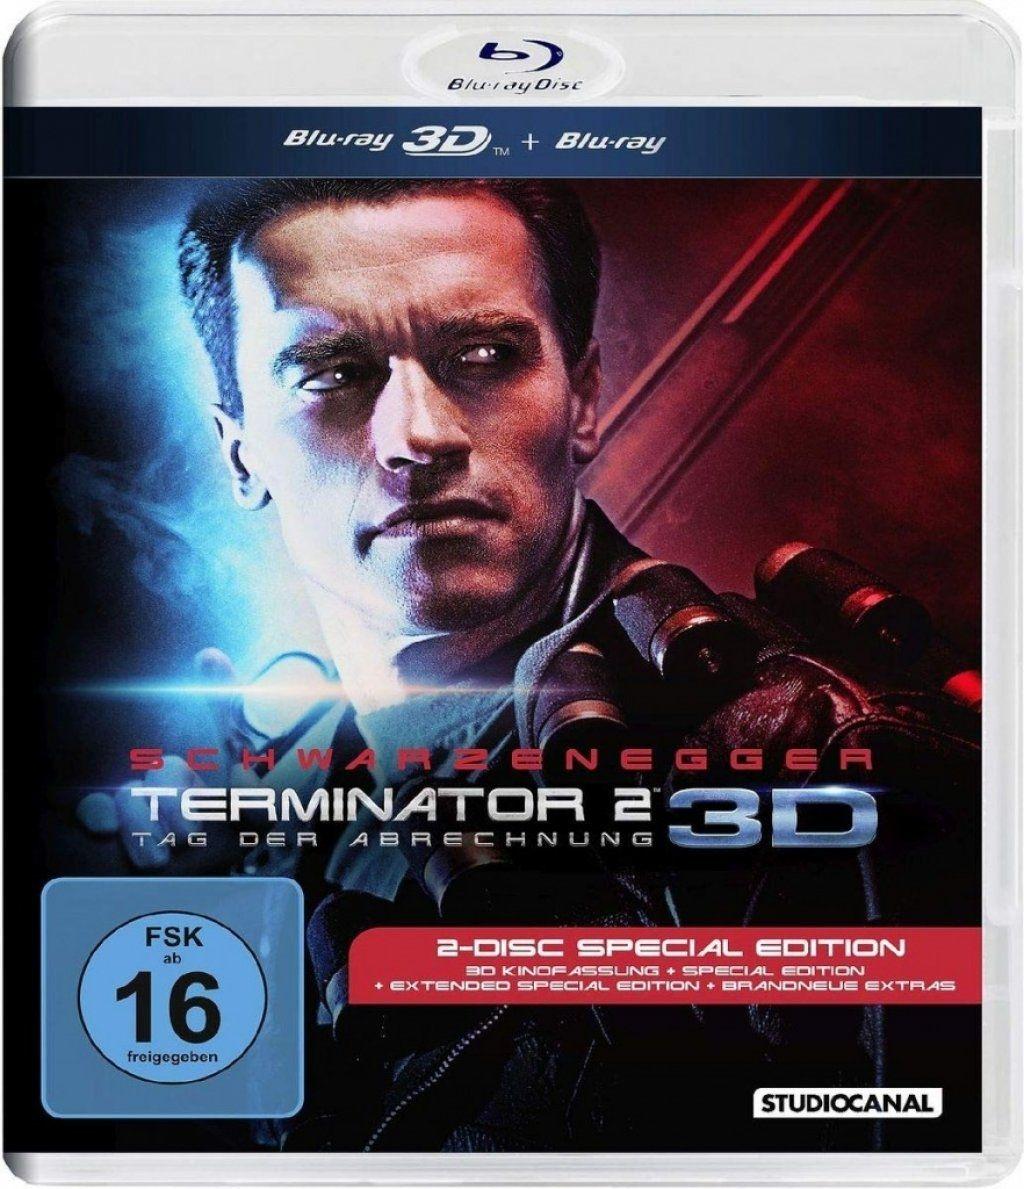 Terminator 2 - Tag der Abrechnung 3D (2 Discs) (BLURAY + BLURAY 3D)